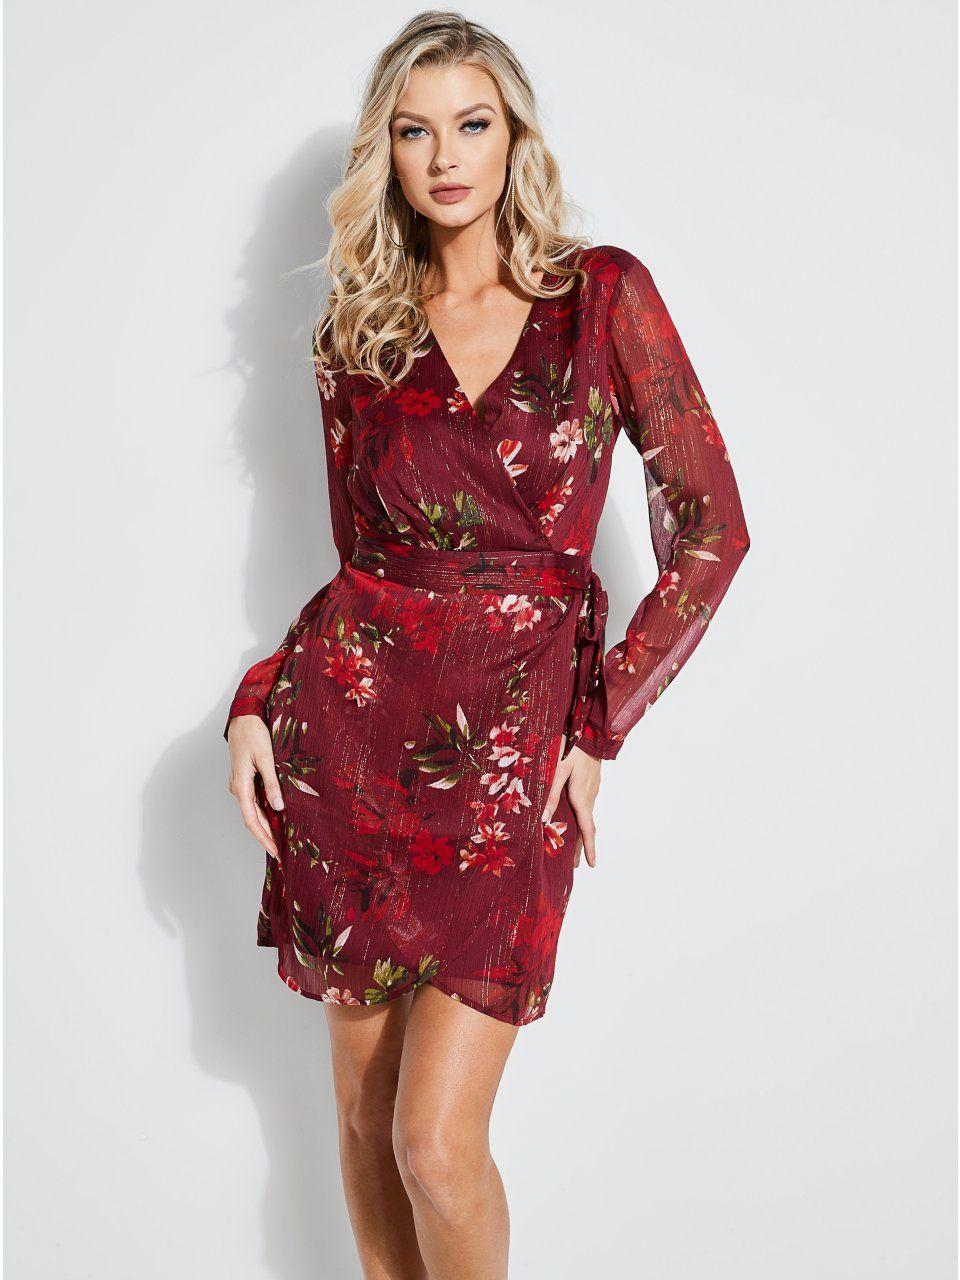 0daf082fb206 Camilla Floral Surplice Dress in 2019 | Products | Dresses, Camilla ...